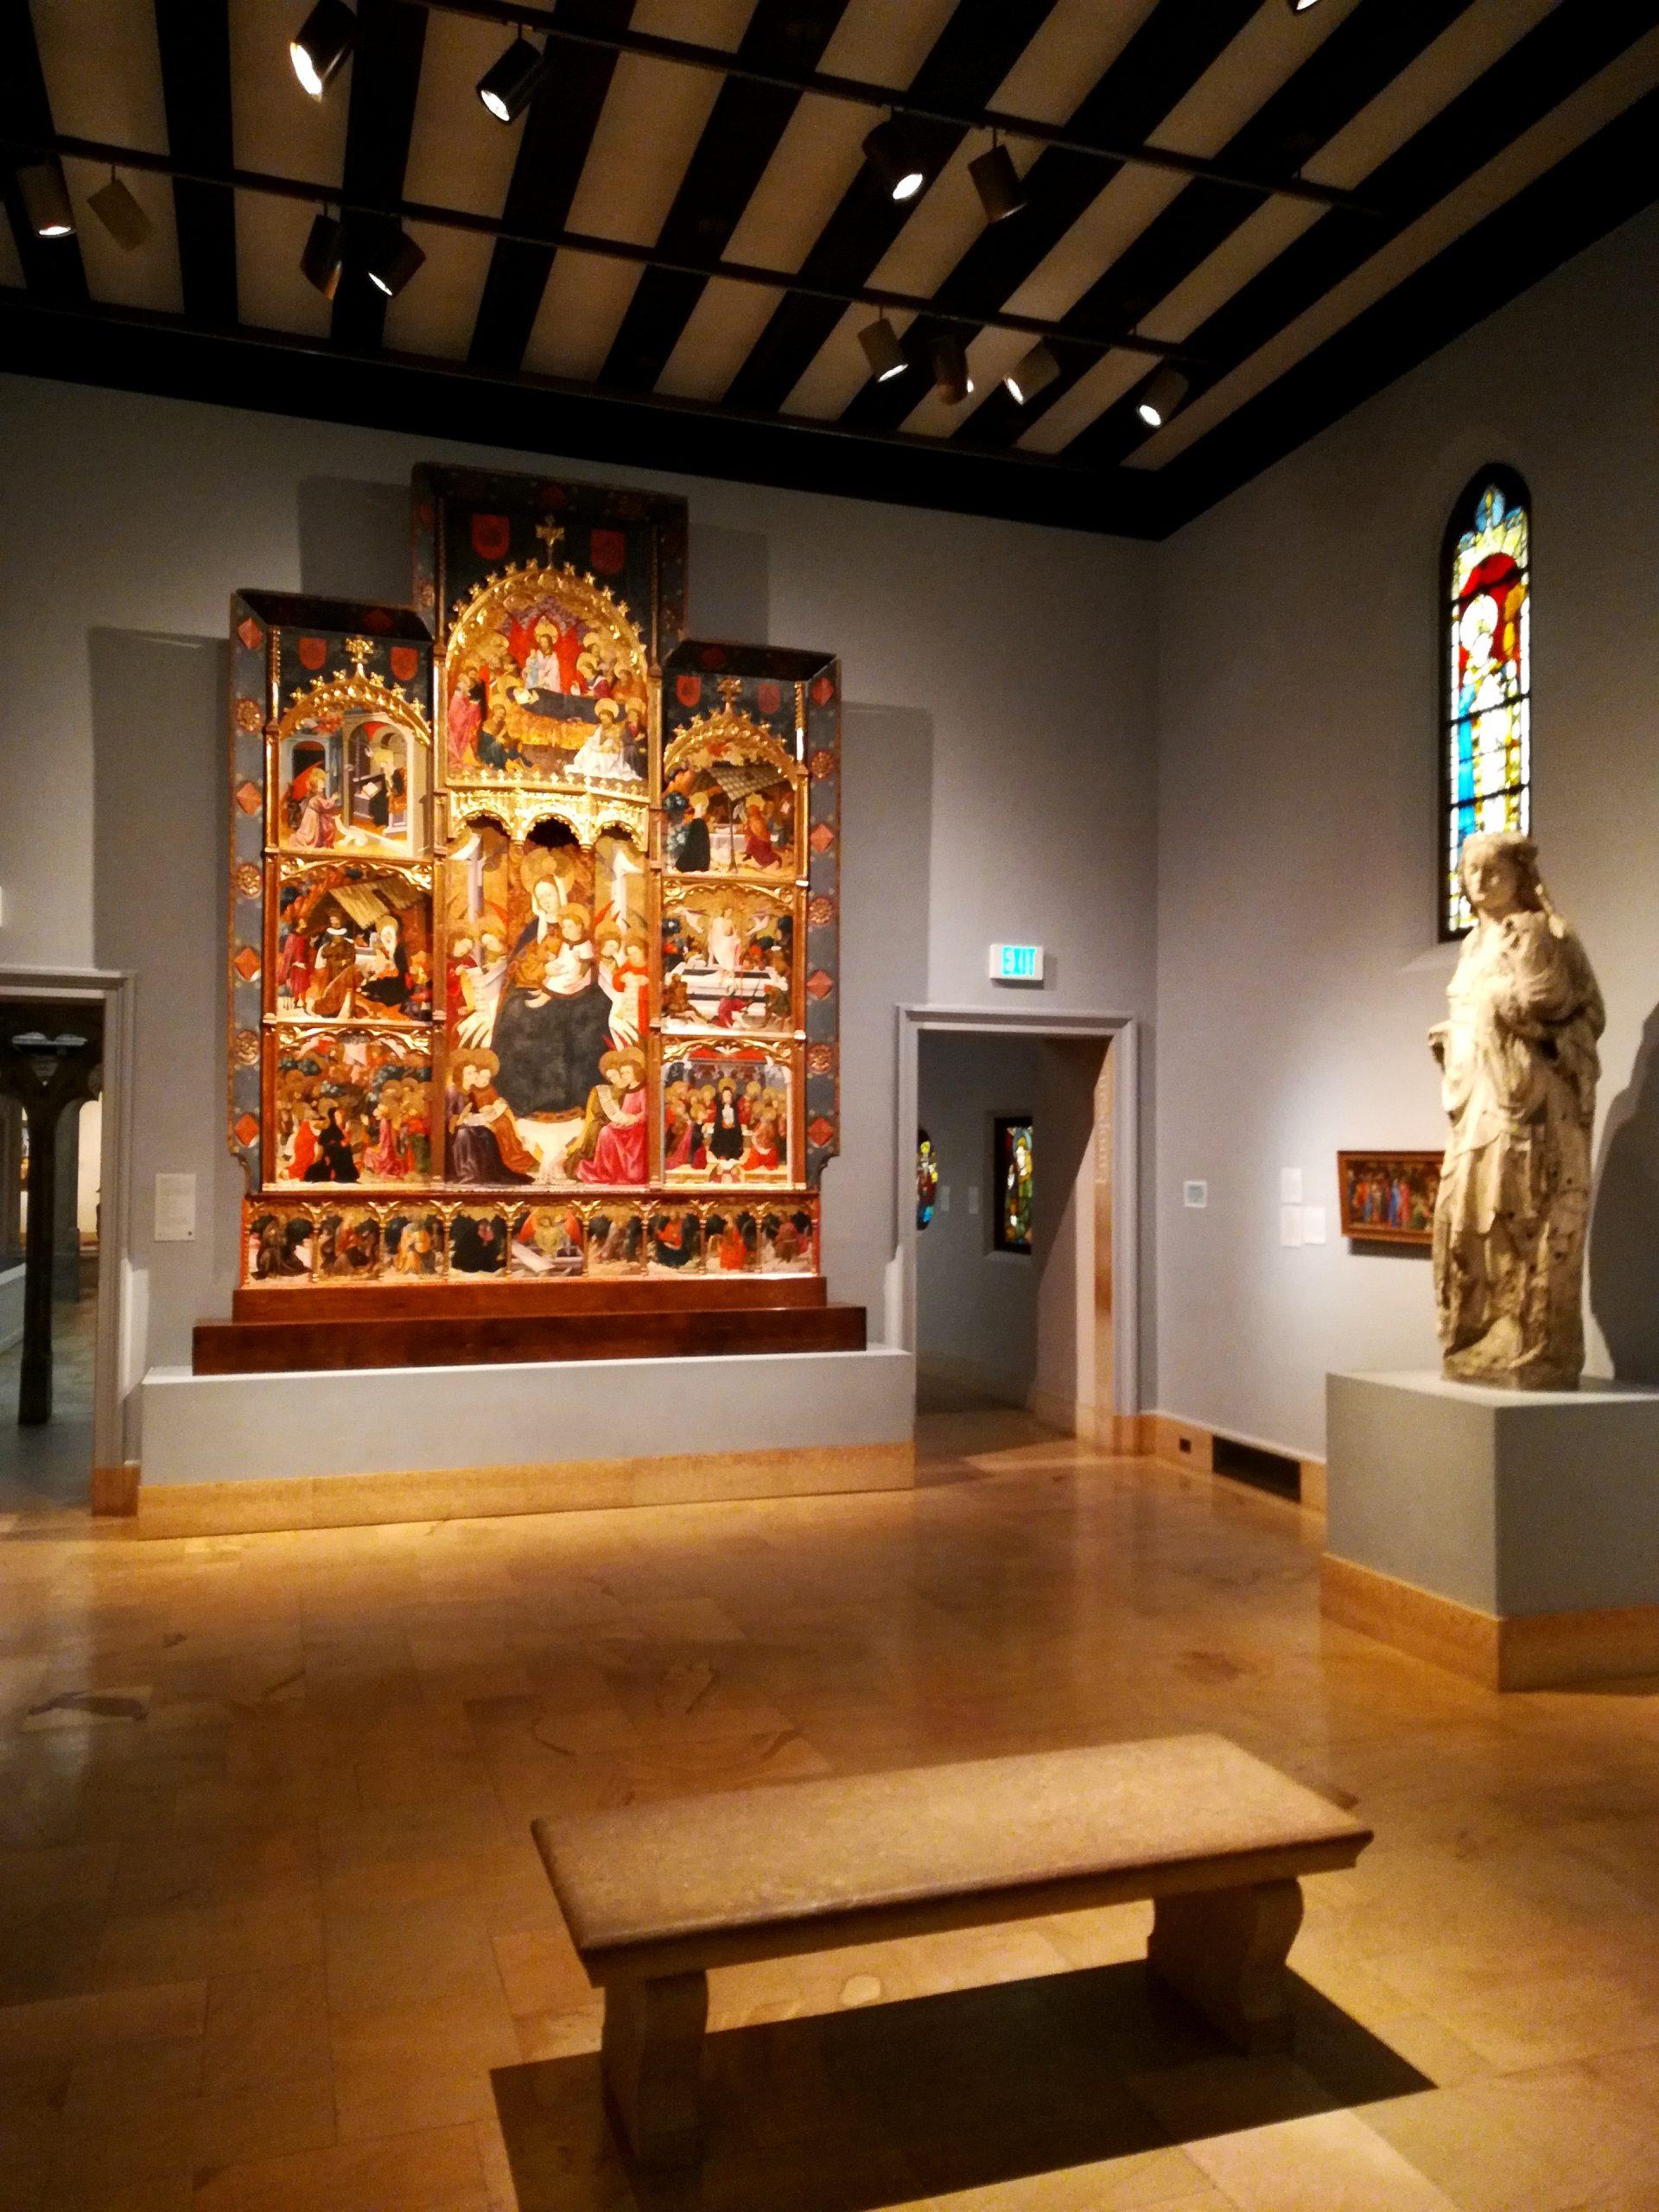 Christian Installation Nelson-Atkins Museum of Art Kansas City KCMO